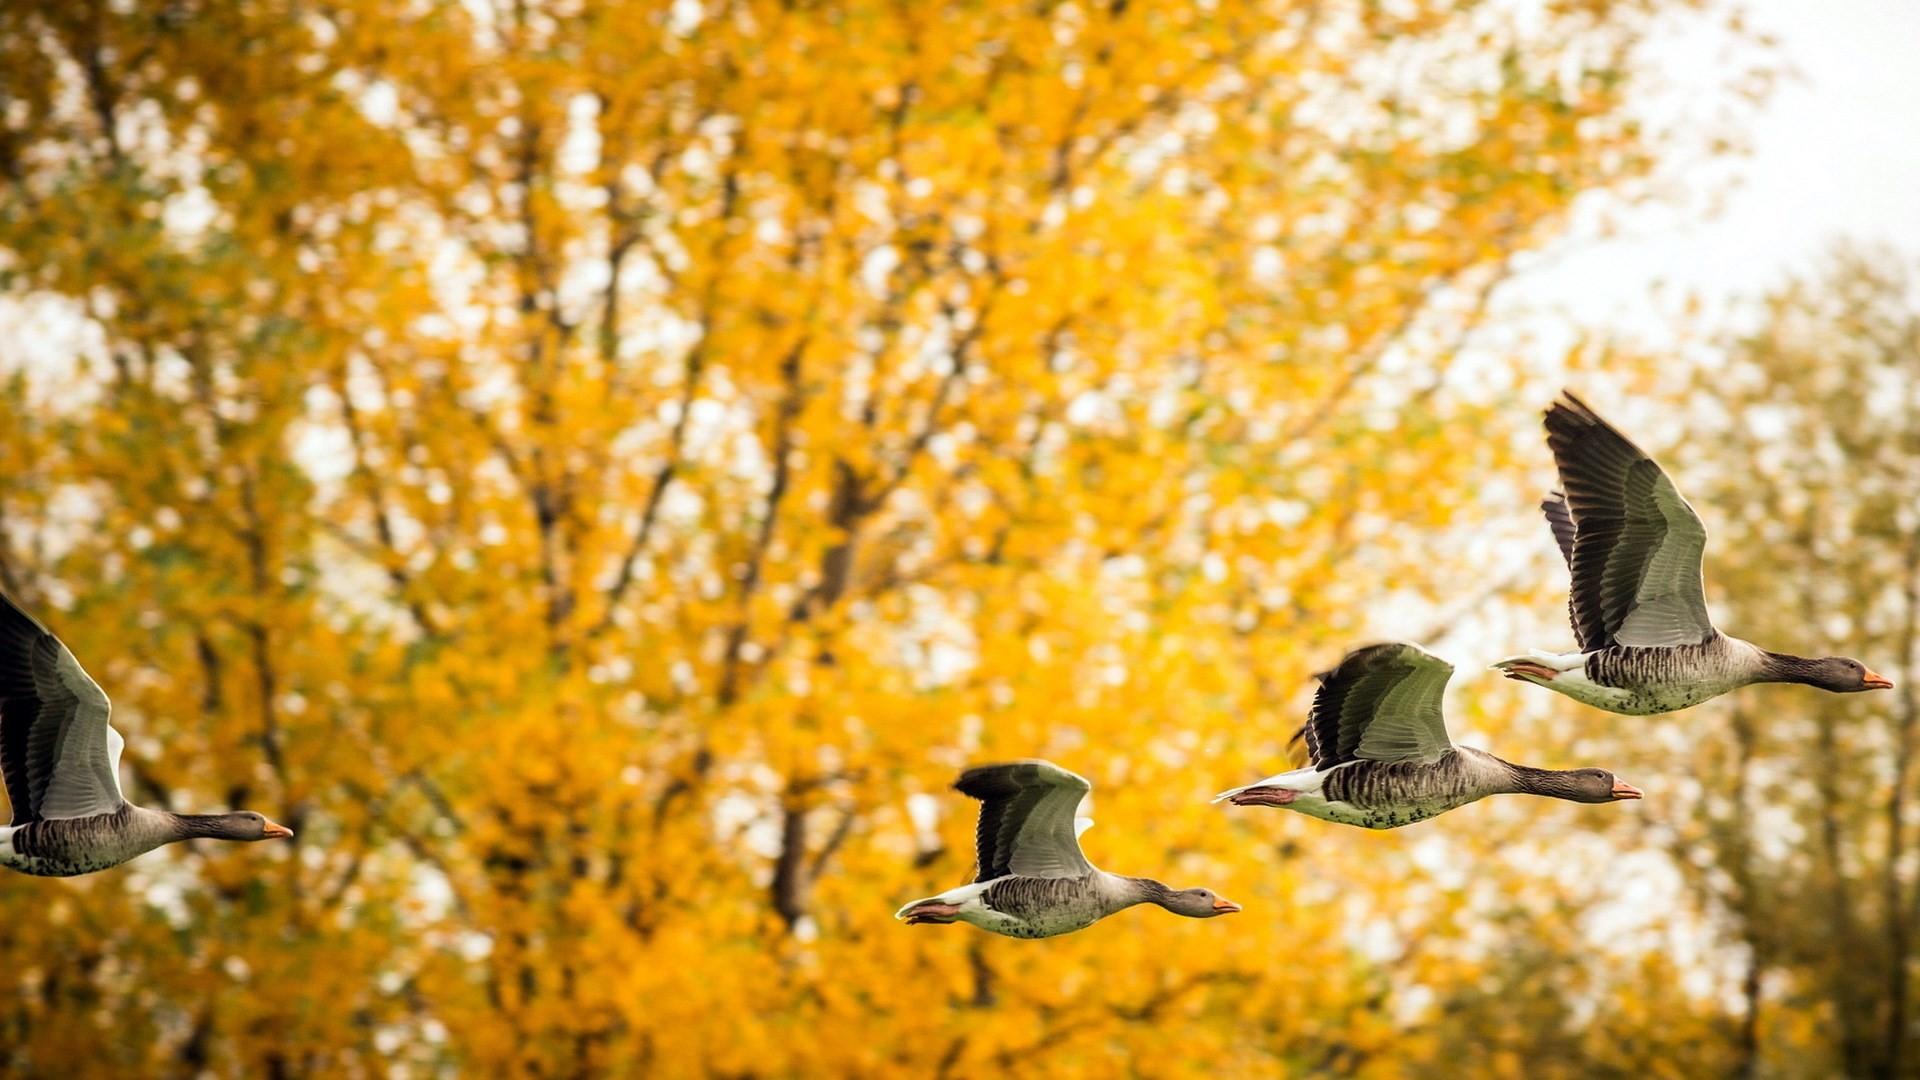 Res: 1920x1080, Ducks Birds Fall Nature